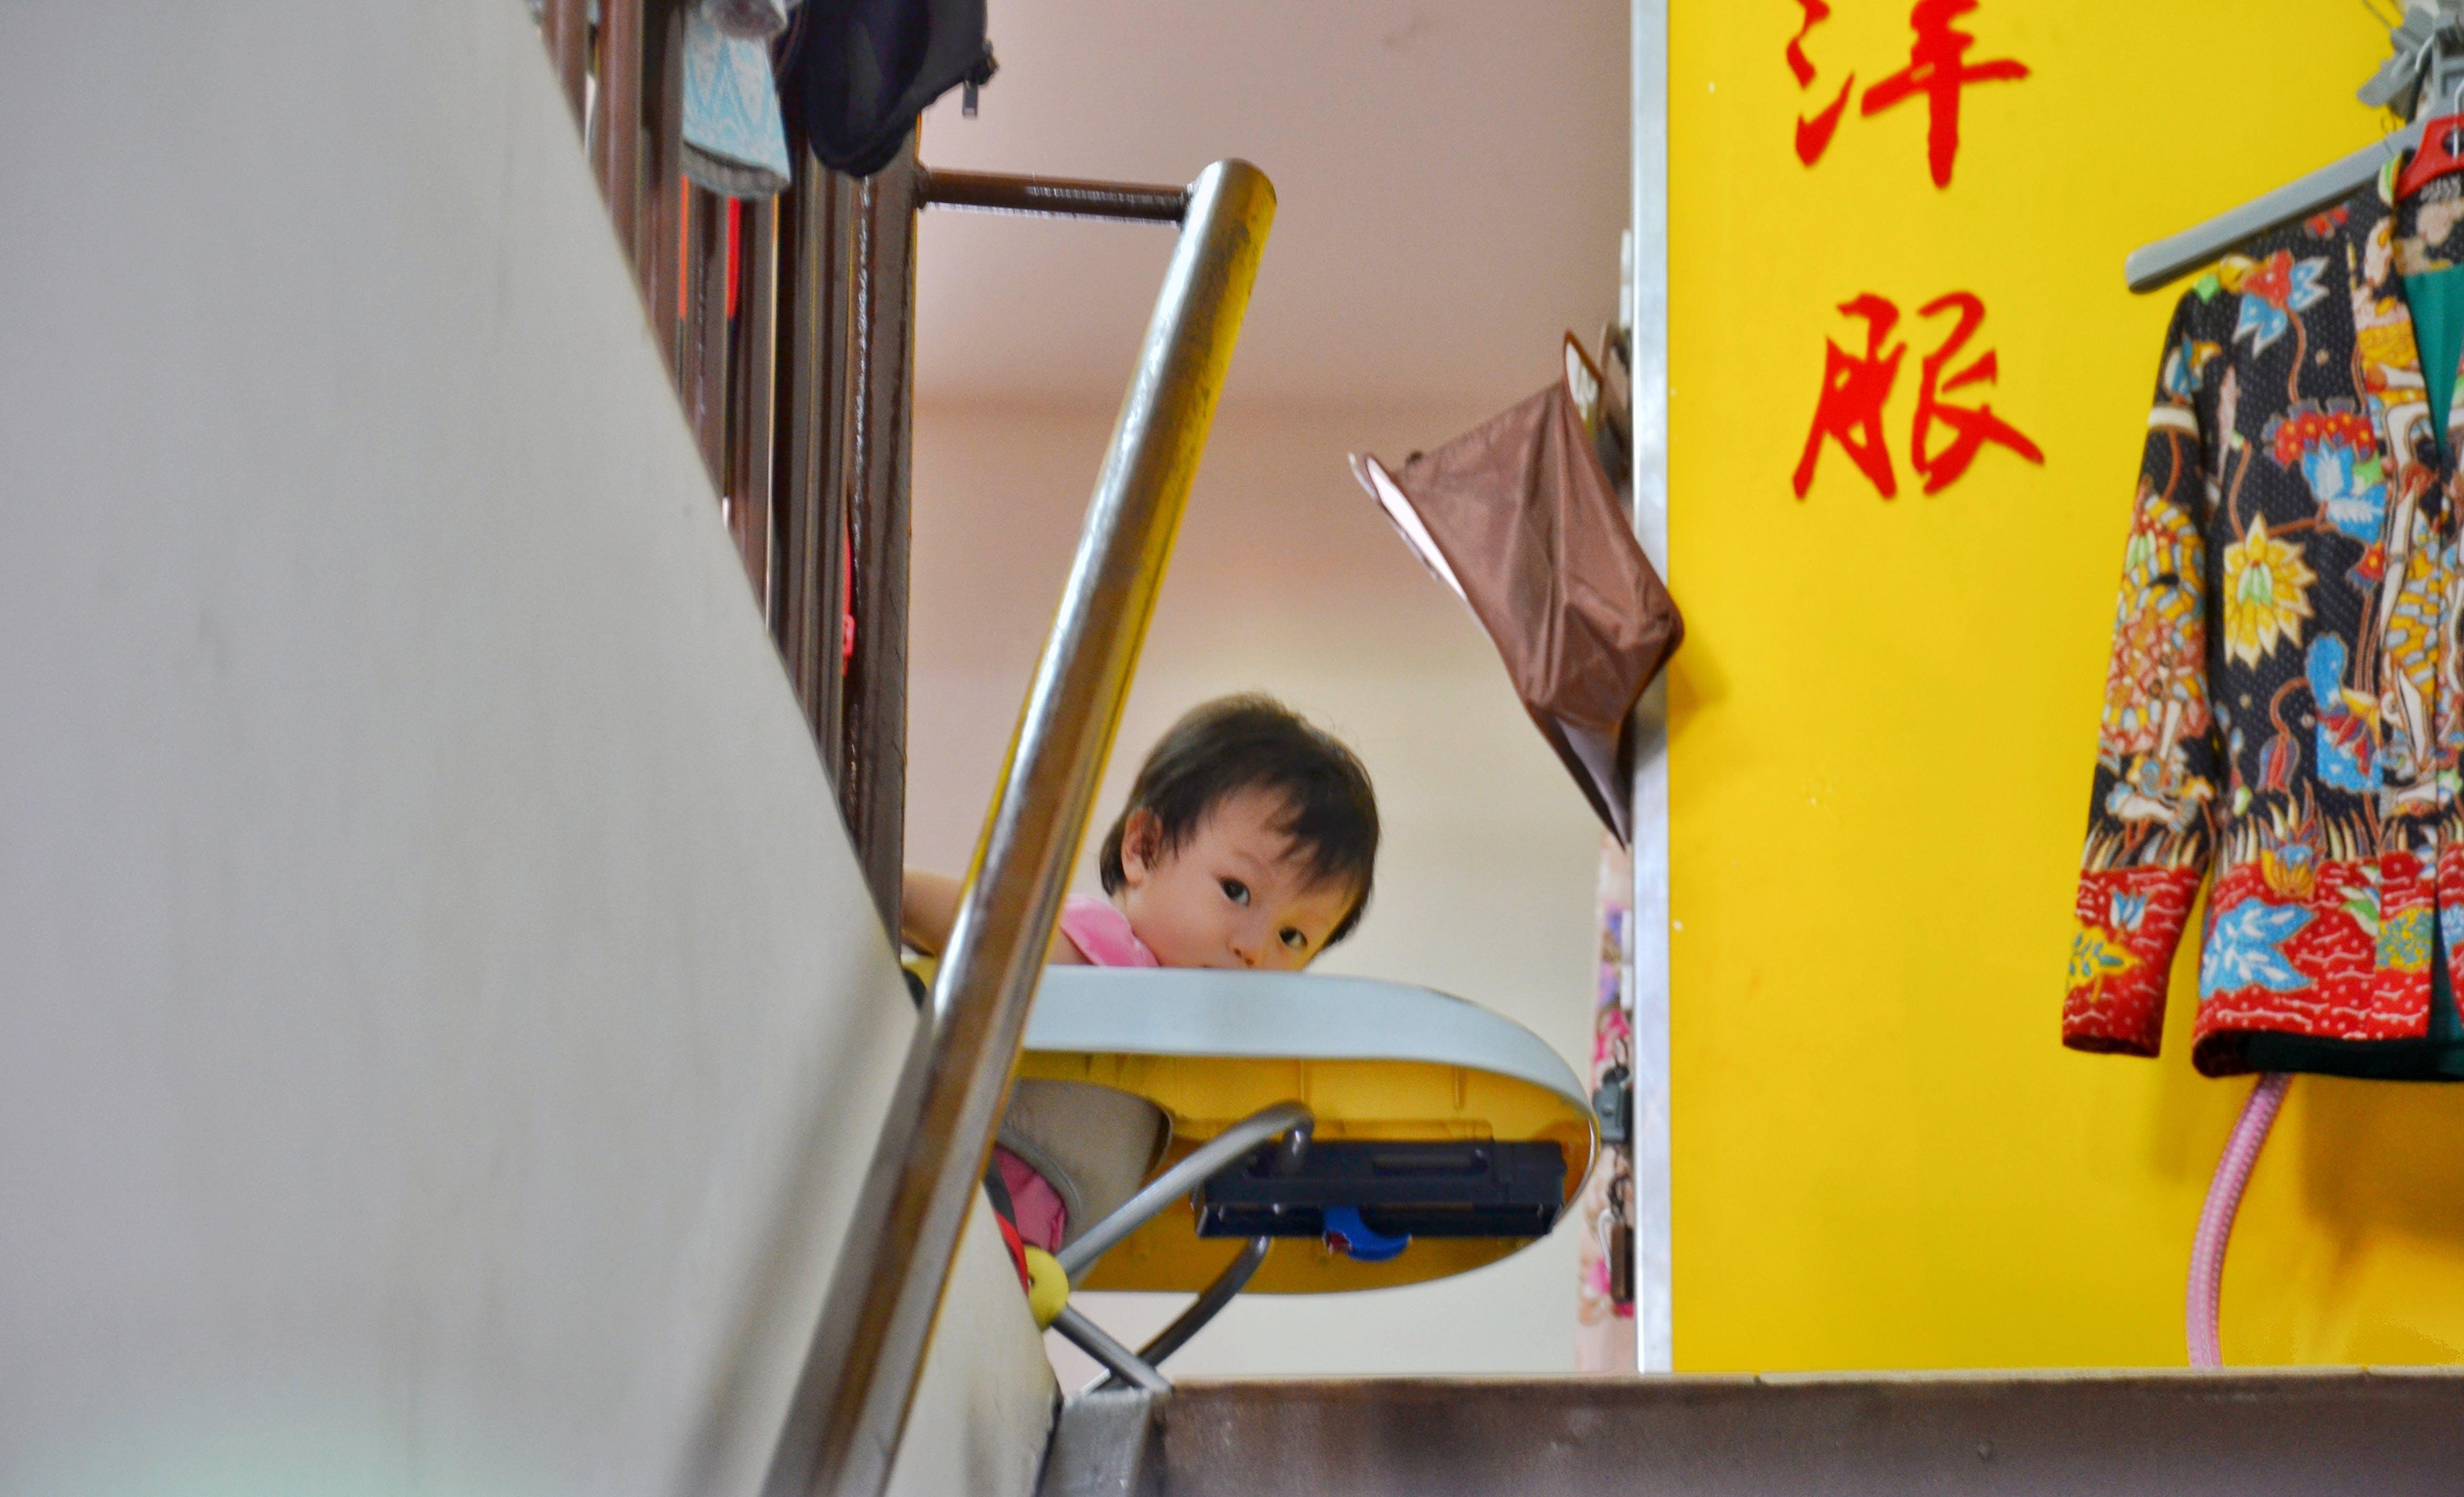 Free stock photo of #kuching #sarawak #malaysia, #streetphotography #street #baby #carpenterstreet